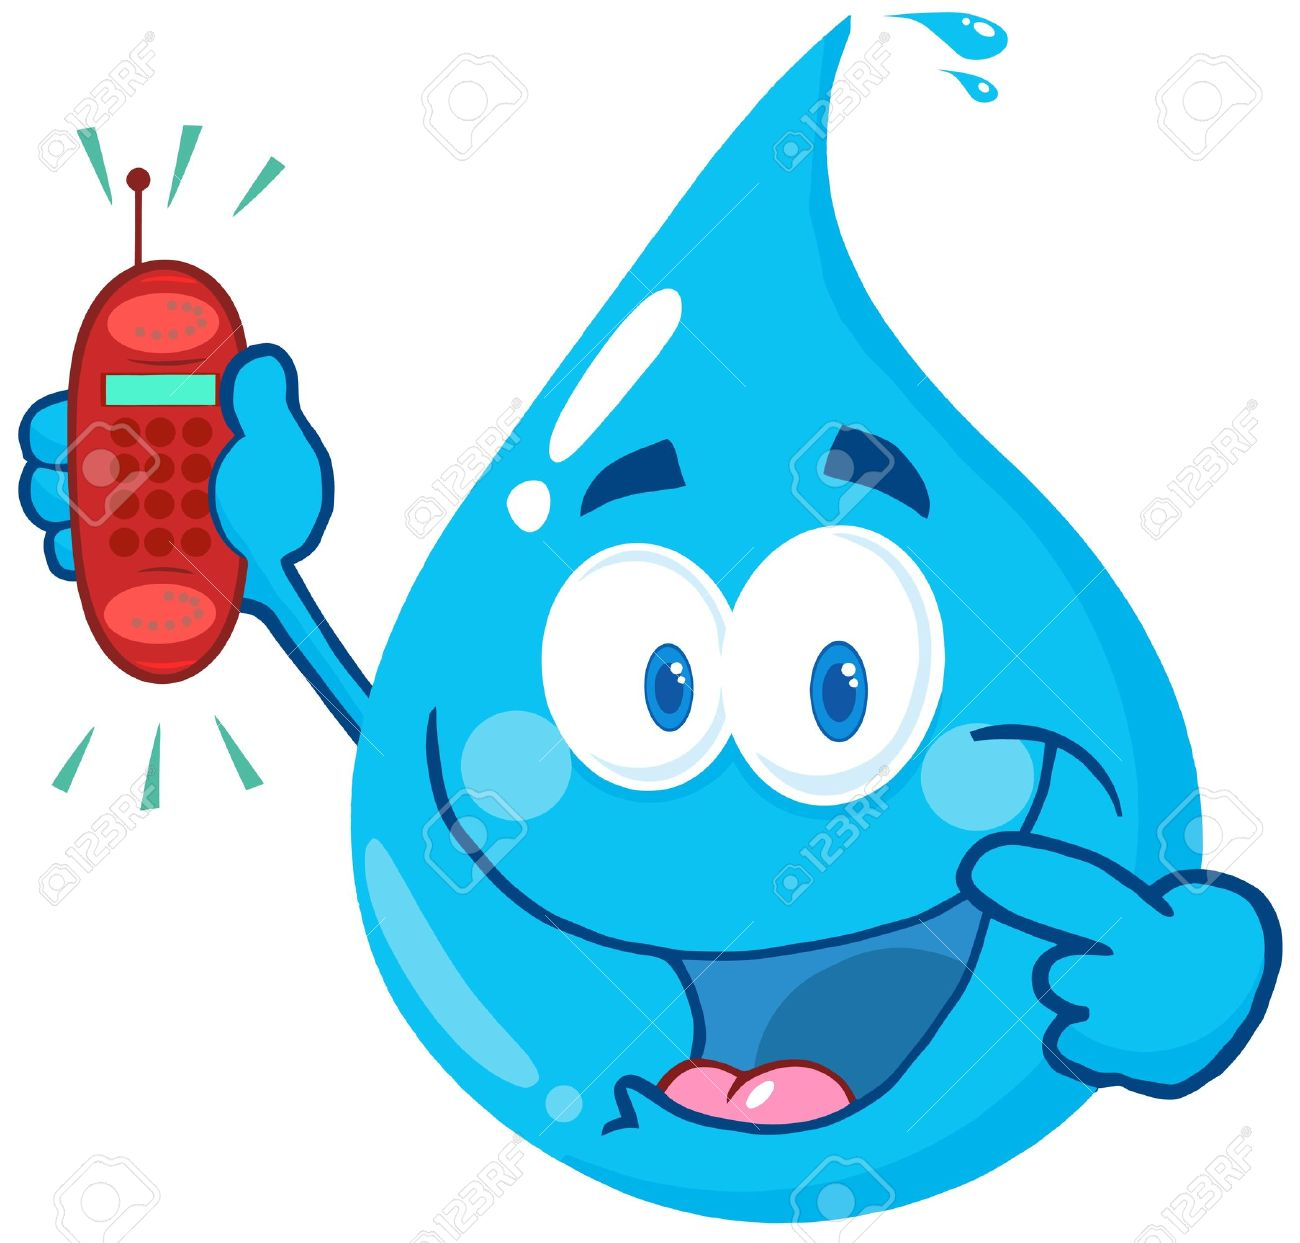 Gota De Agua Feliz De Dibujos Animados La Celebración De Un Teléfono